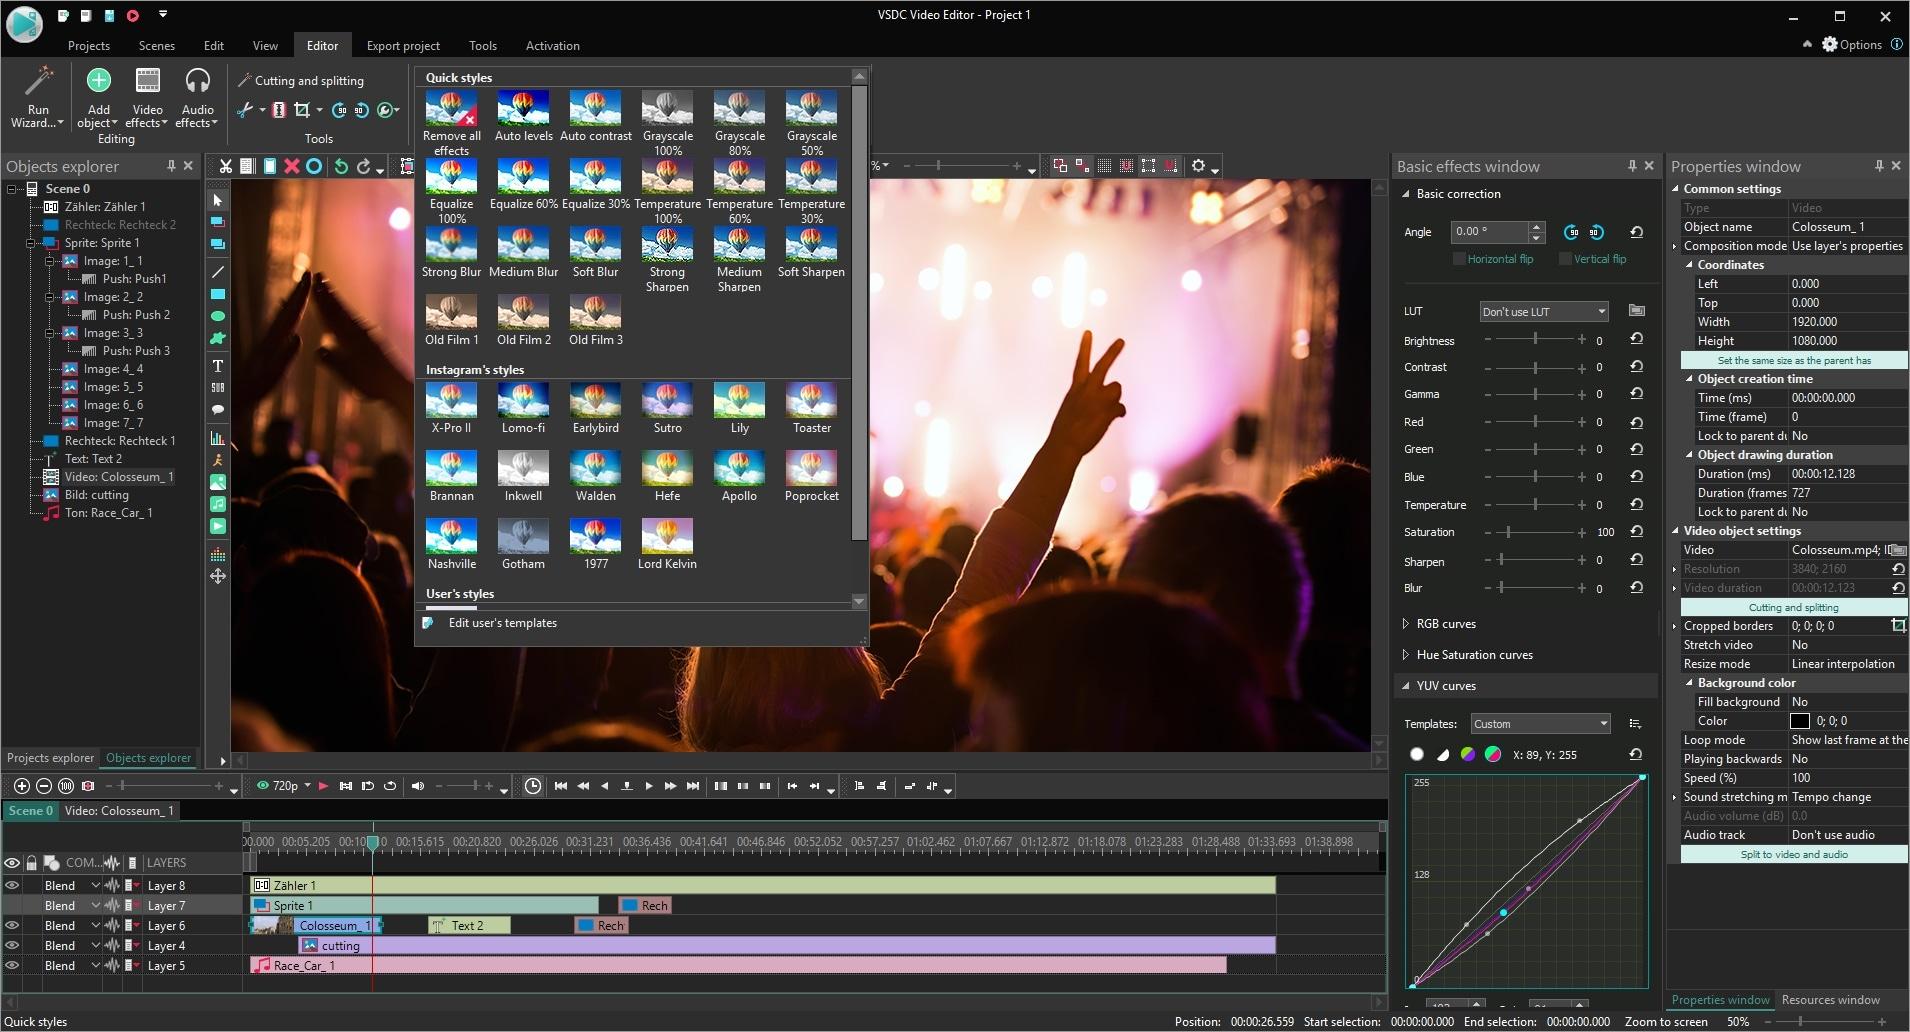 VSDC Pro Video Editor Lifetime License, Video Software Screenshot